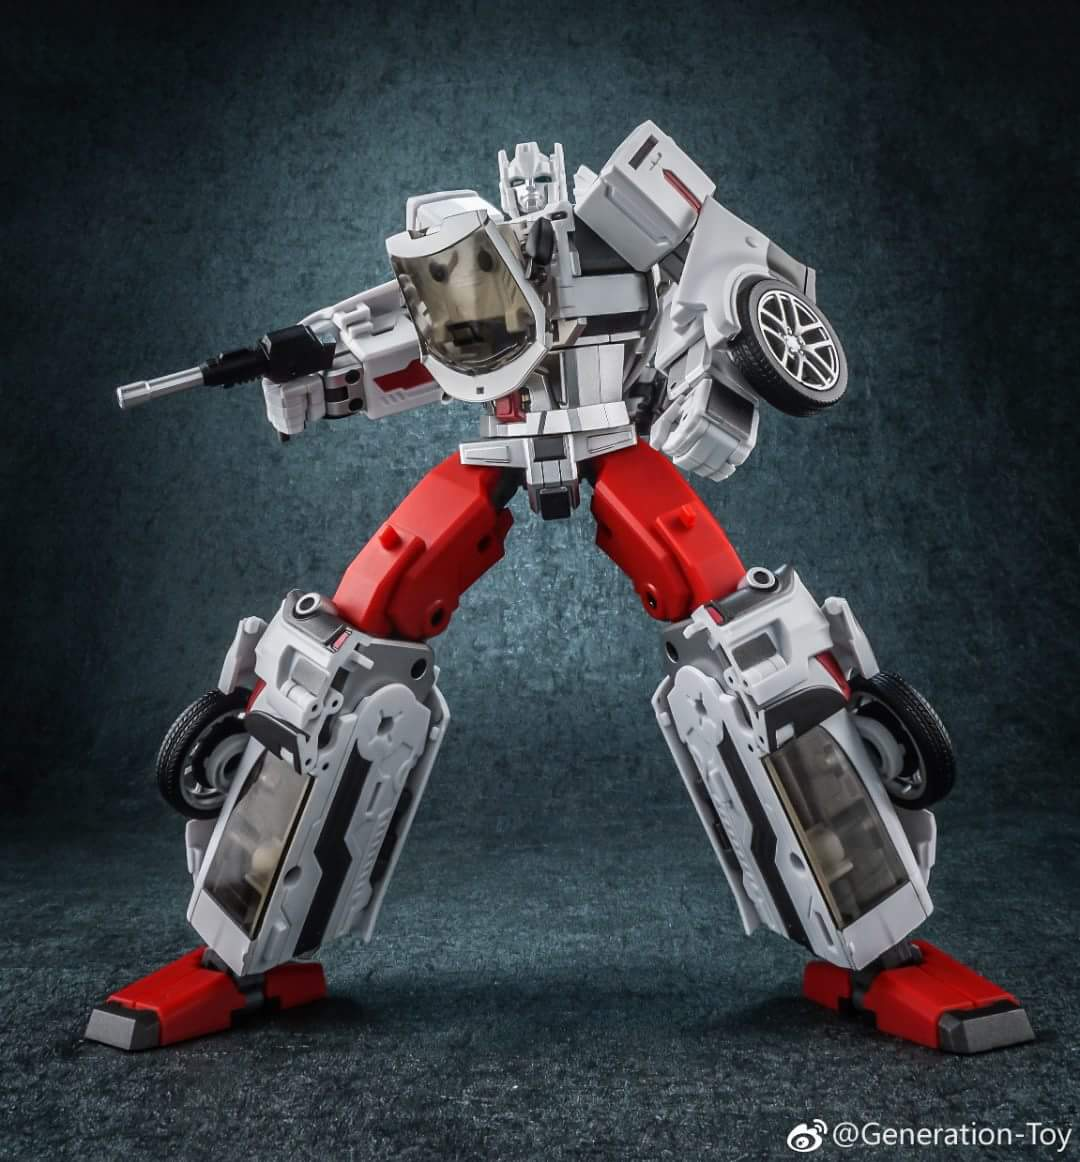 [Generation Toy] Produit Tiers - Jouet GT-08 Guardian - aka Defensor/Defenso VtsOByWQ_o